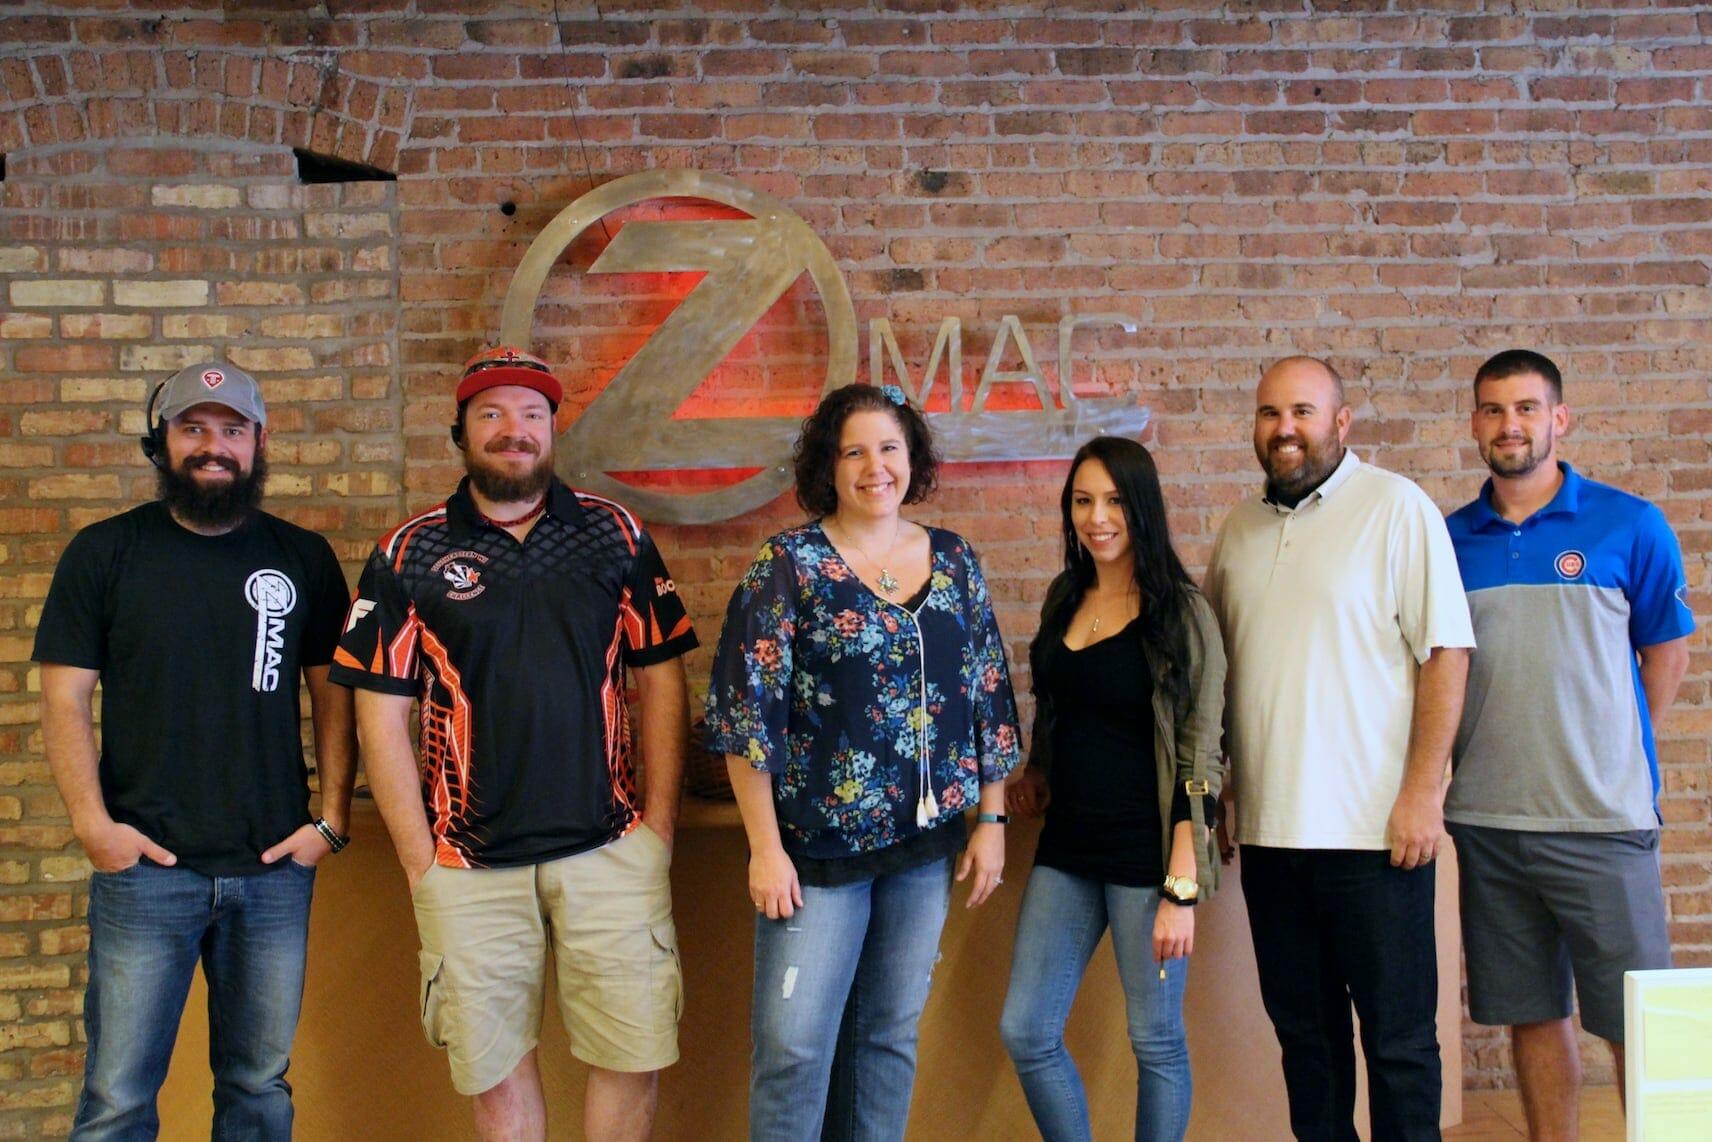 ZMac Logistics Careers - the team